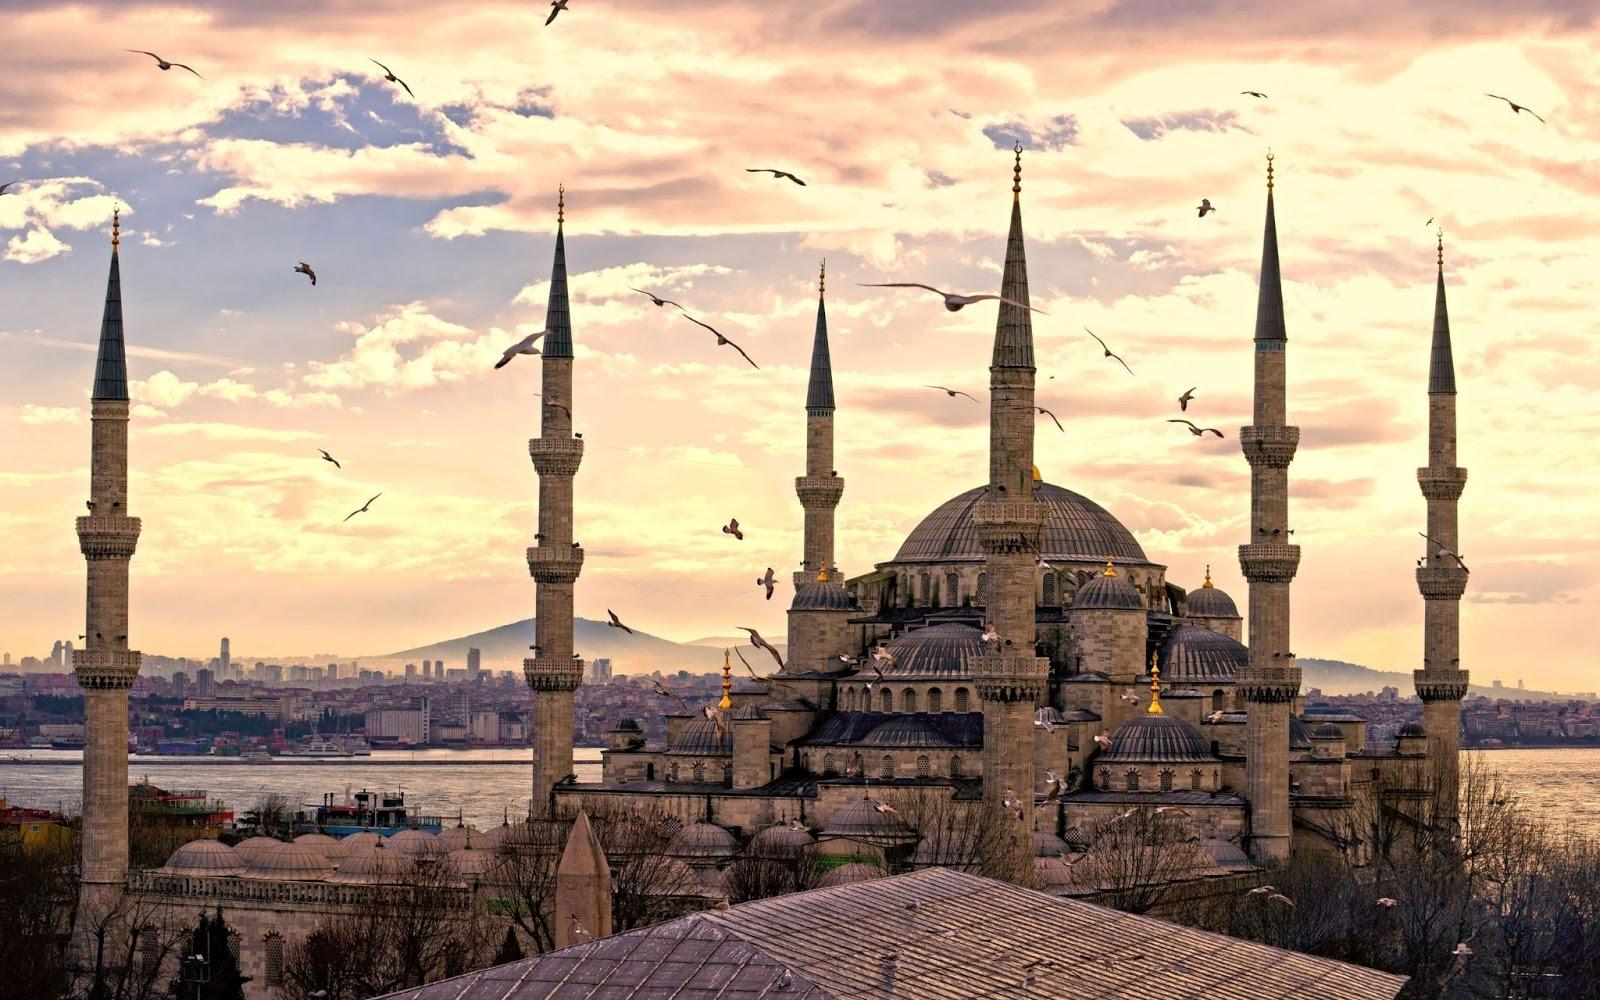 http://2.bp.blogspot.com/-lWM96RxzyWk/UV6fFONkaeI/AAAAAAAACl4/whAtb3i0kVQ/s1600/Sultan-Ahmed-Mosque-Istanbul-Turkey.jpg